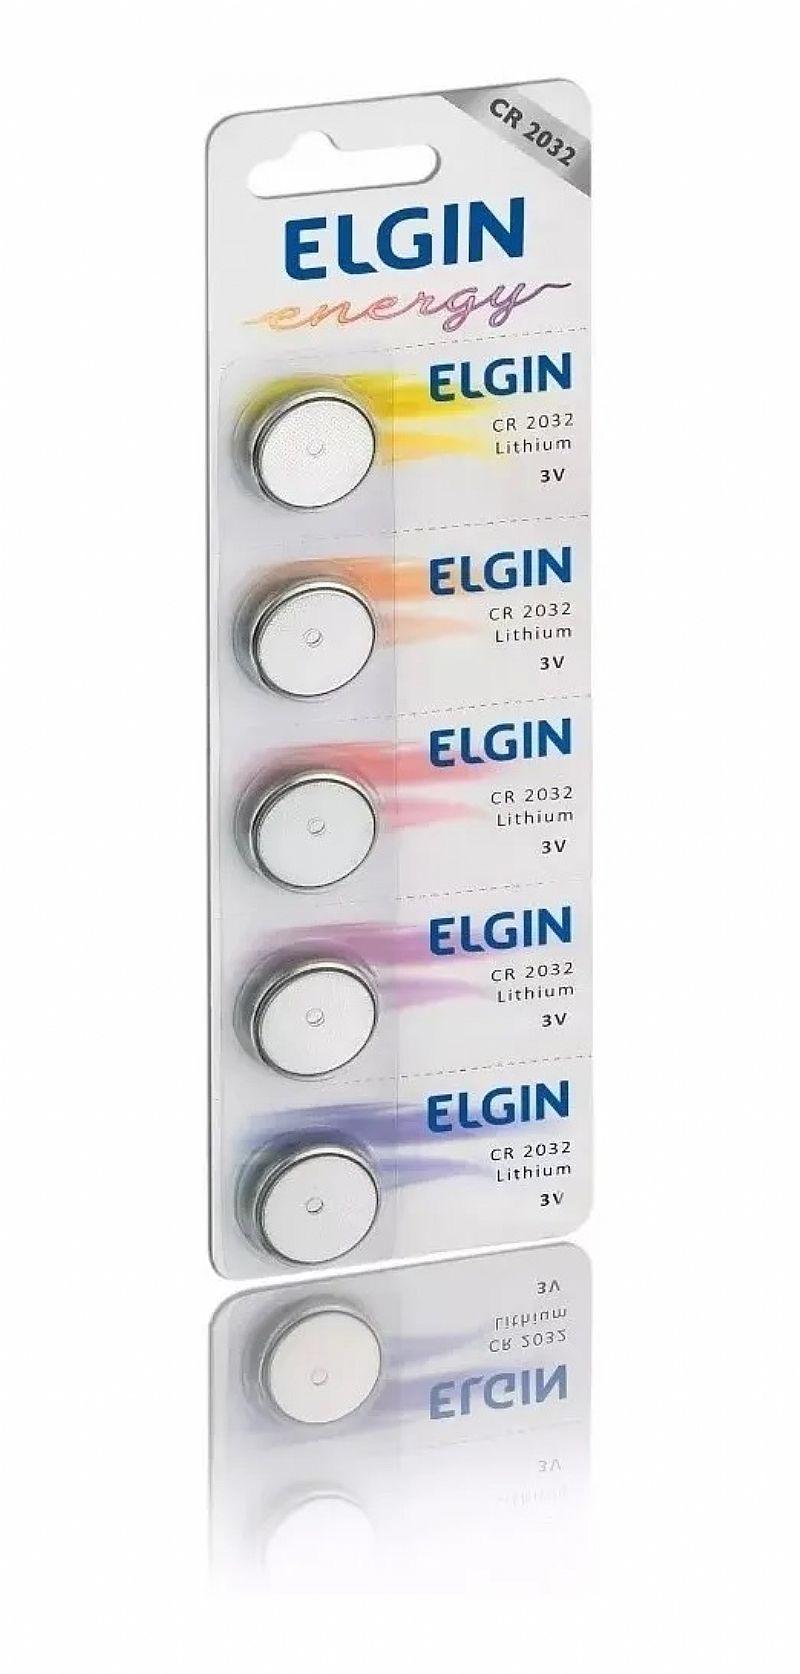 bateria moeda cr2032 3v pilha lithium elgin 3 cartelas